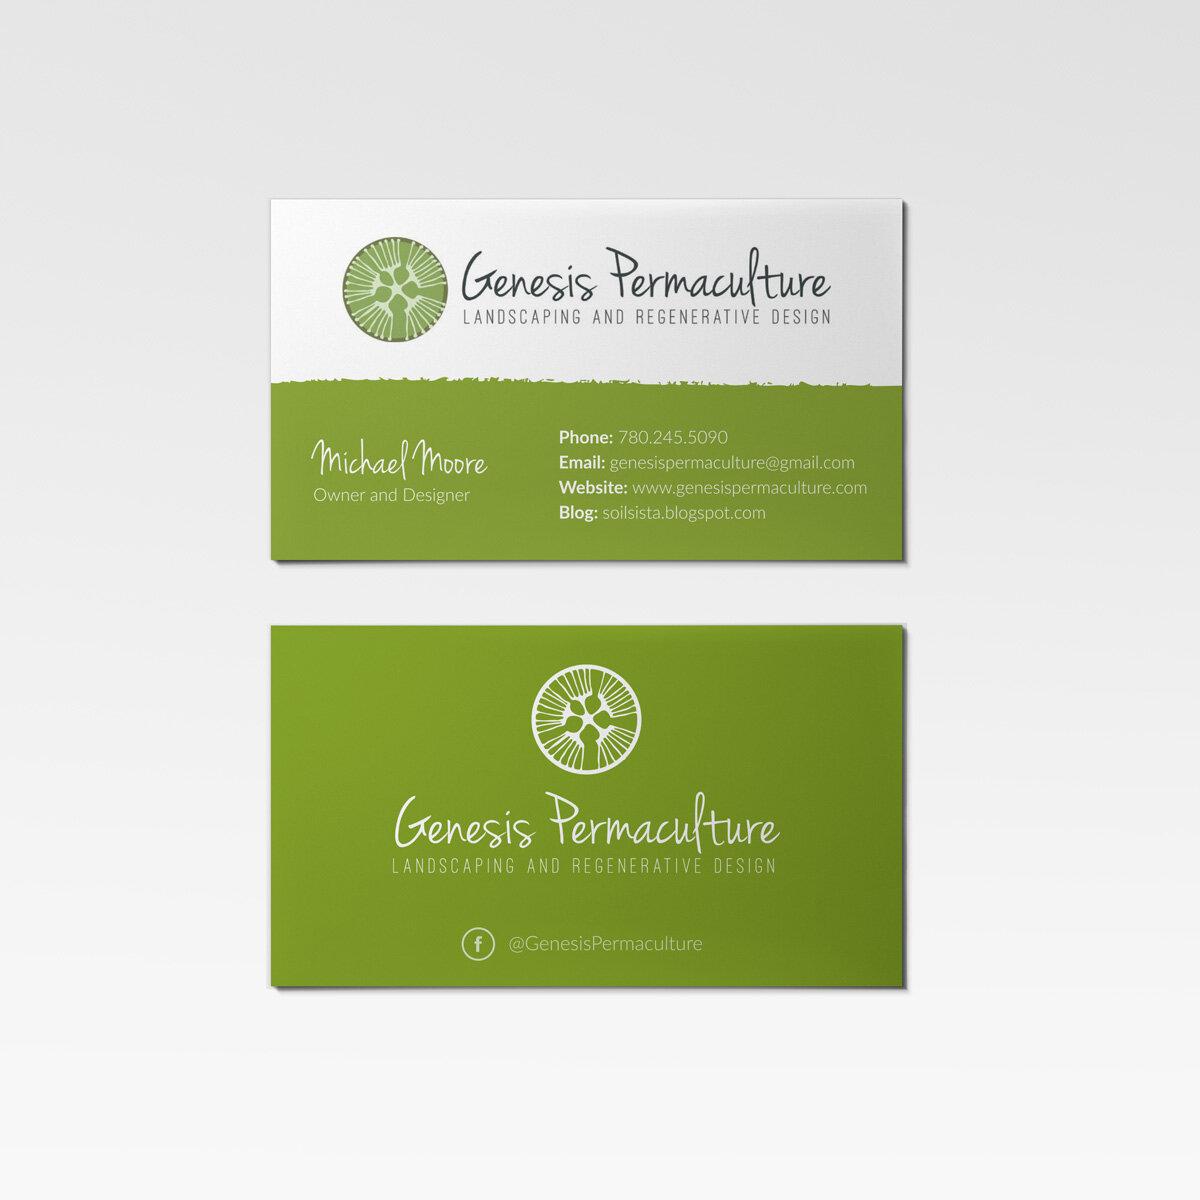 Genesis-Permaculture-Business-Cards.jpg